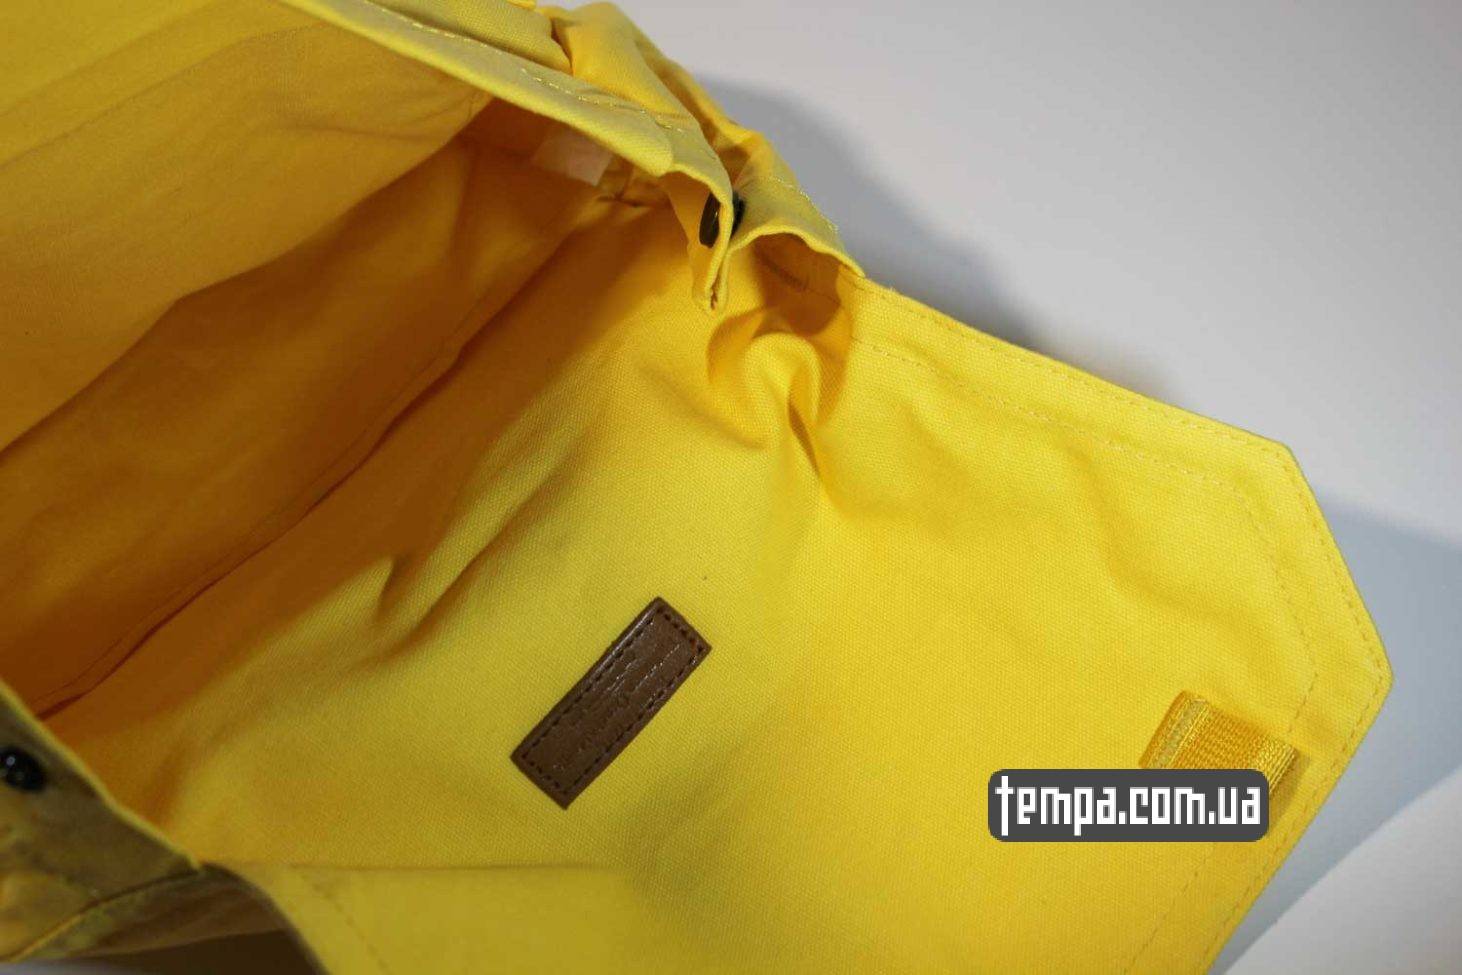 чумоданы равен канкен рюкзак сумка G-1000 FOLDSACK NO.1 fjallraven kanken желтый